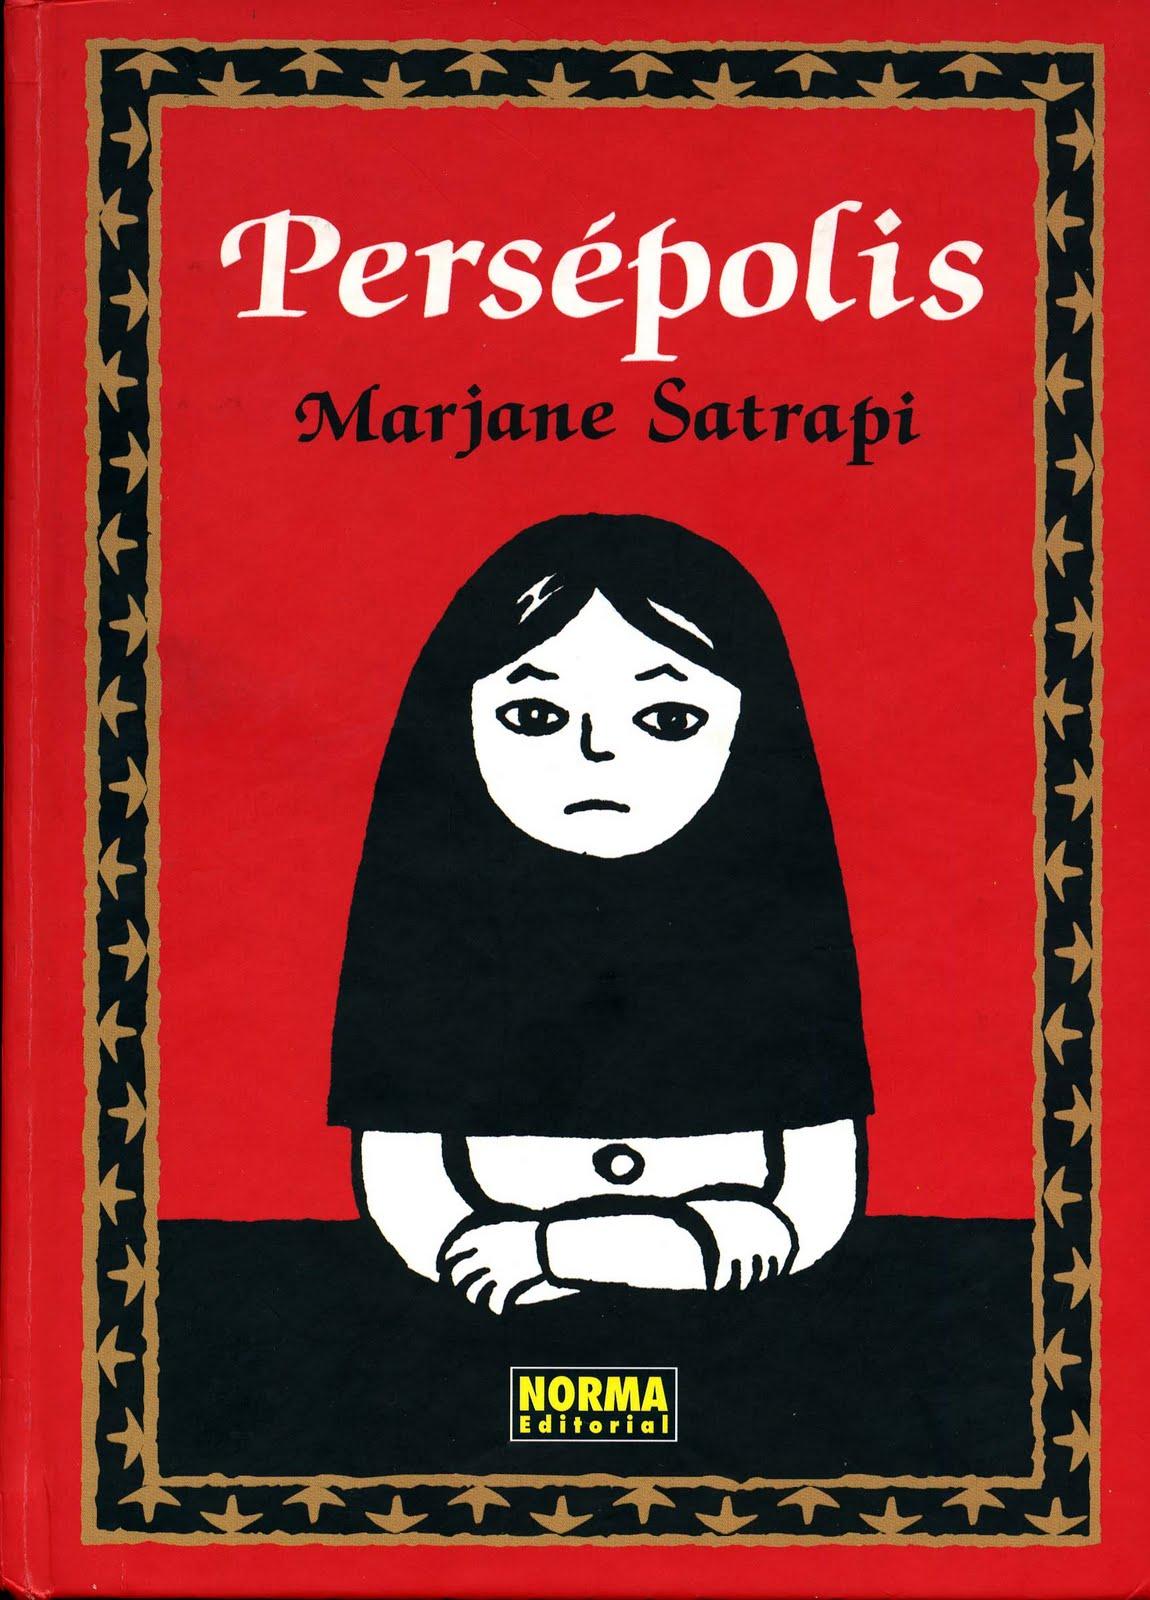 persepolis-cover.jpg